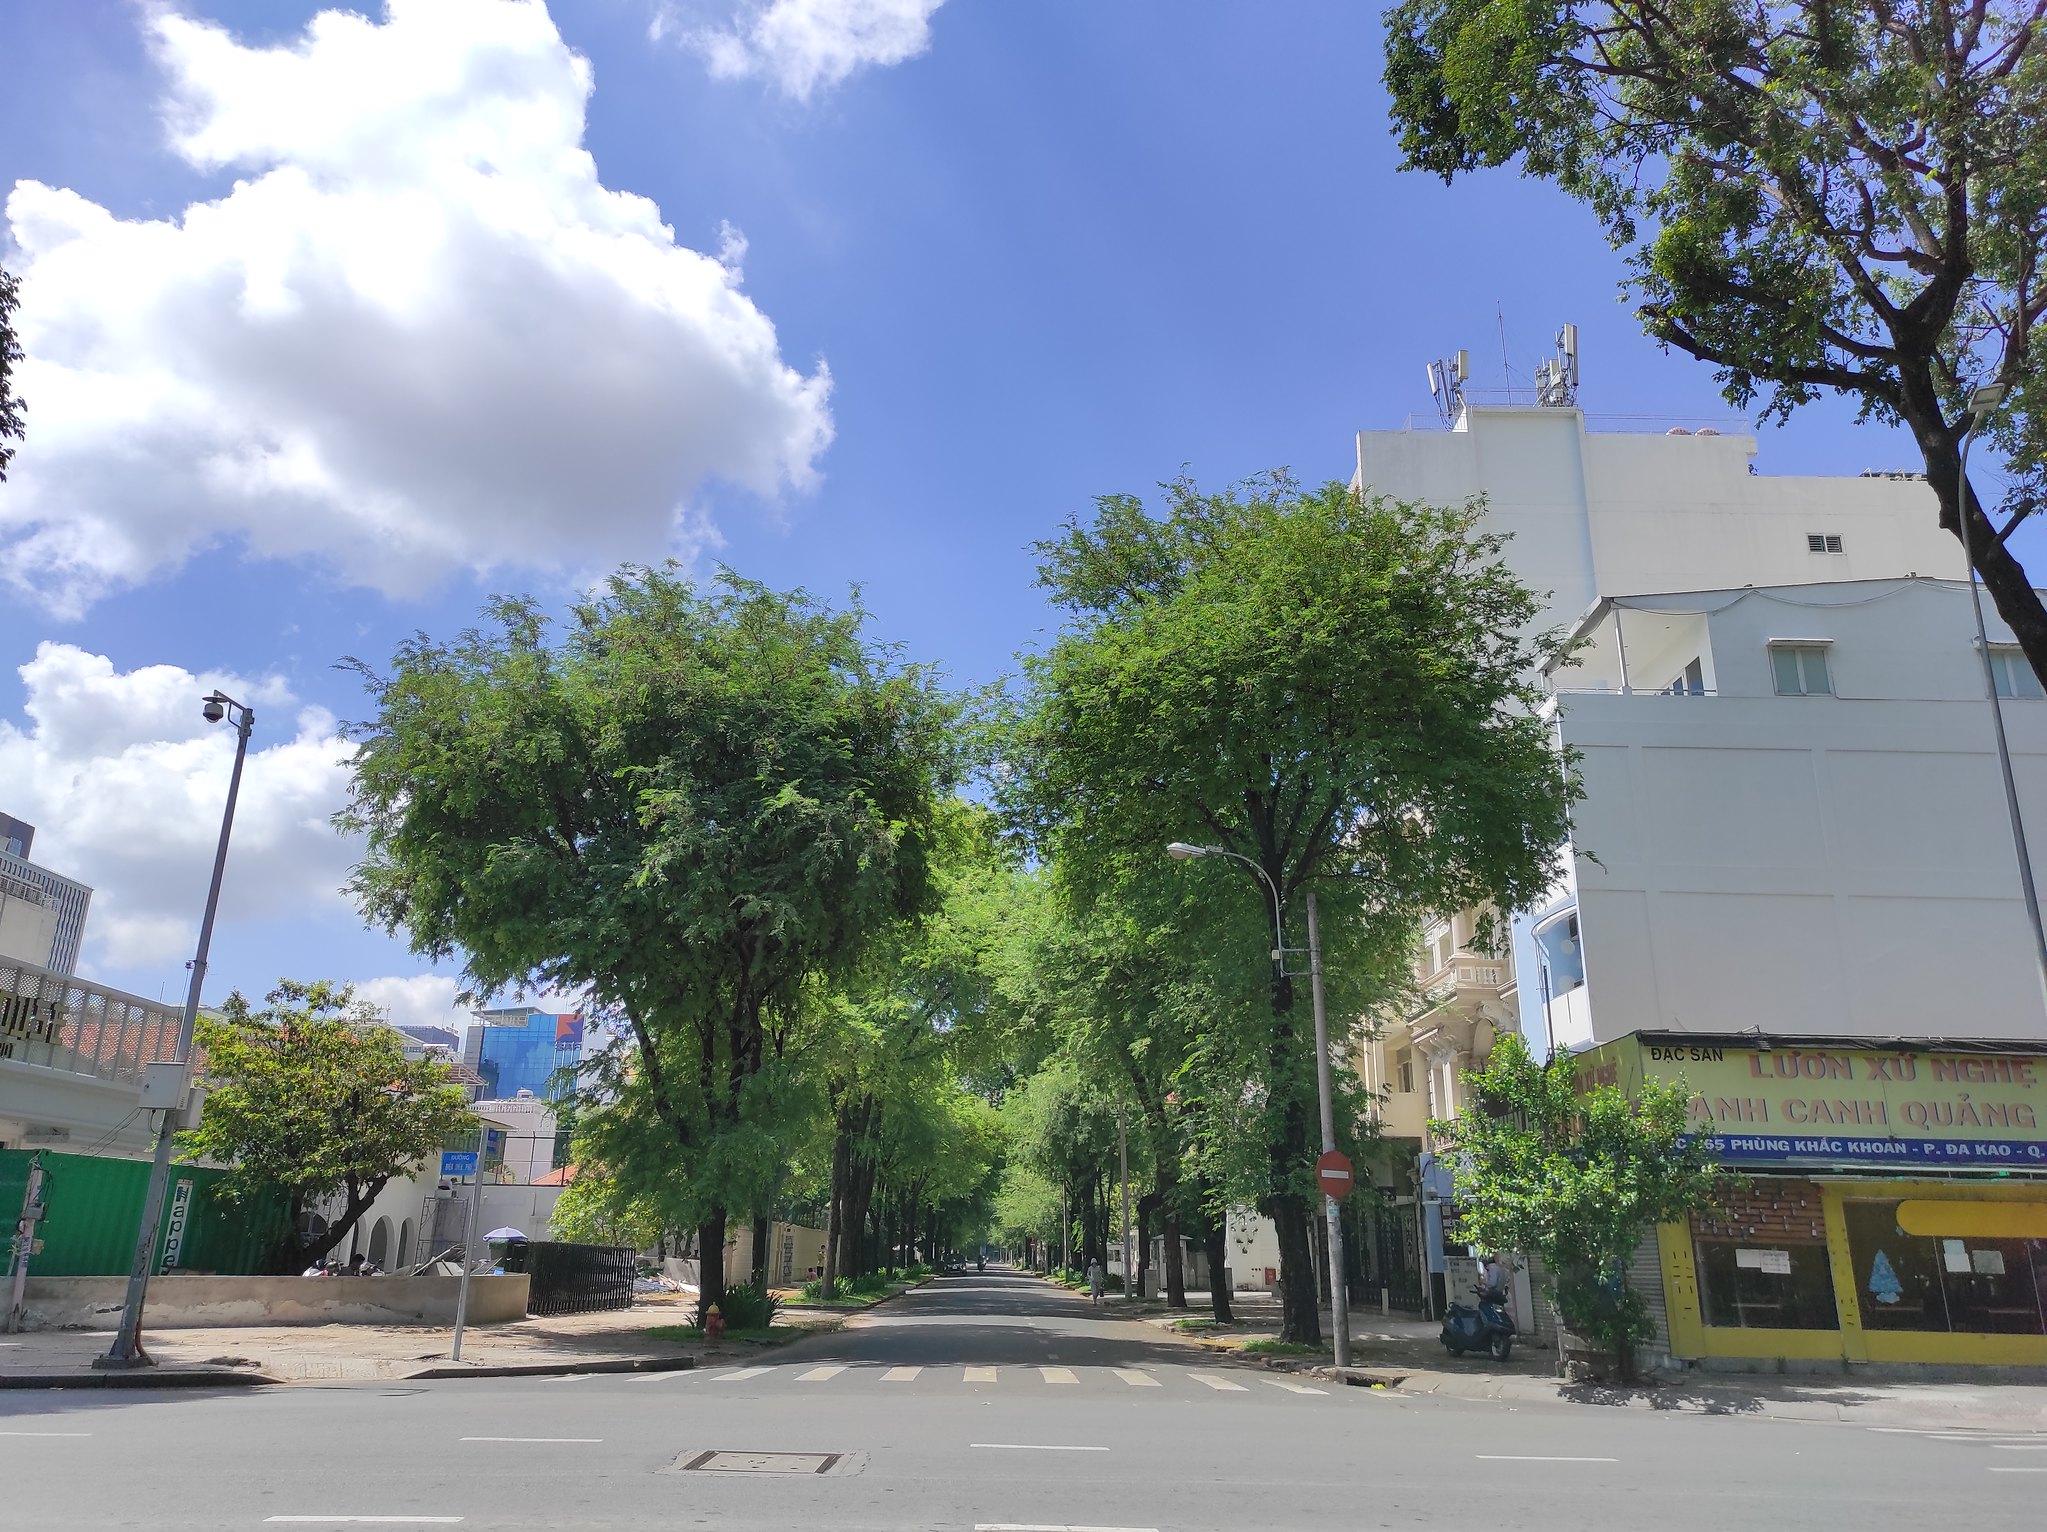 Hochiminh city with Covid